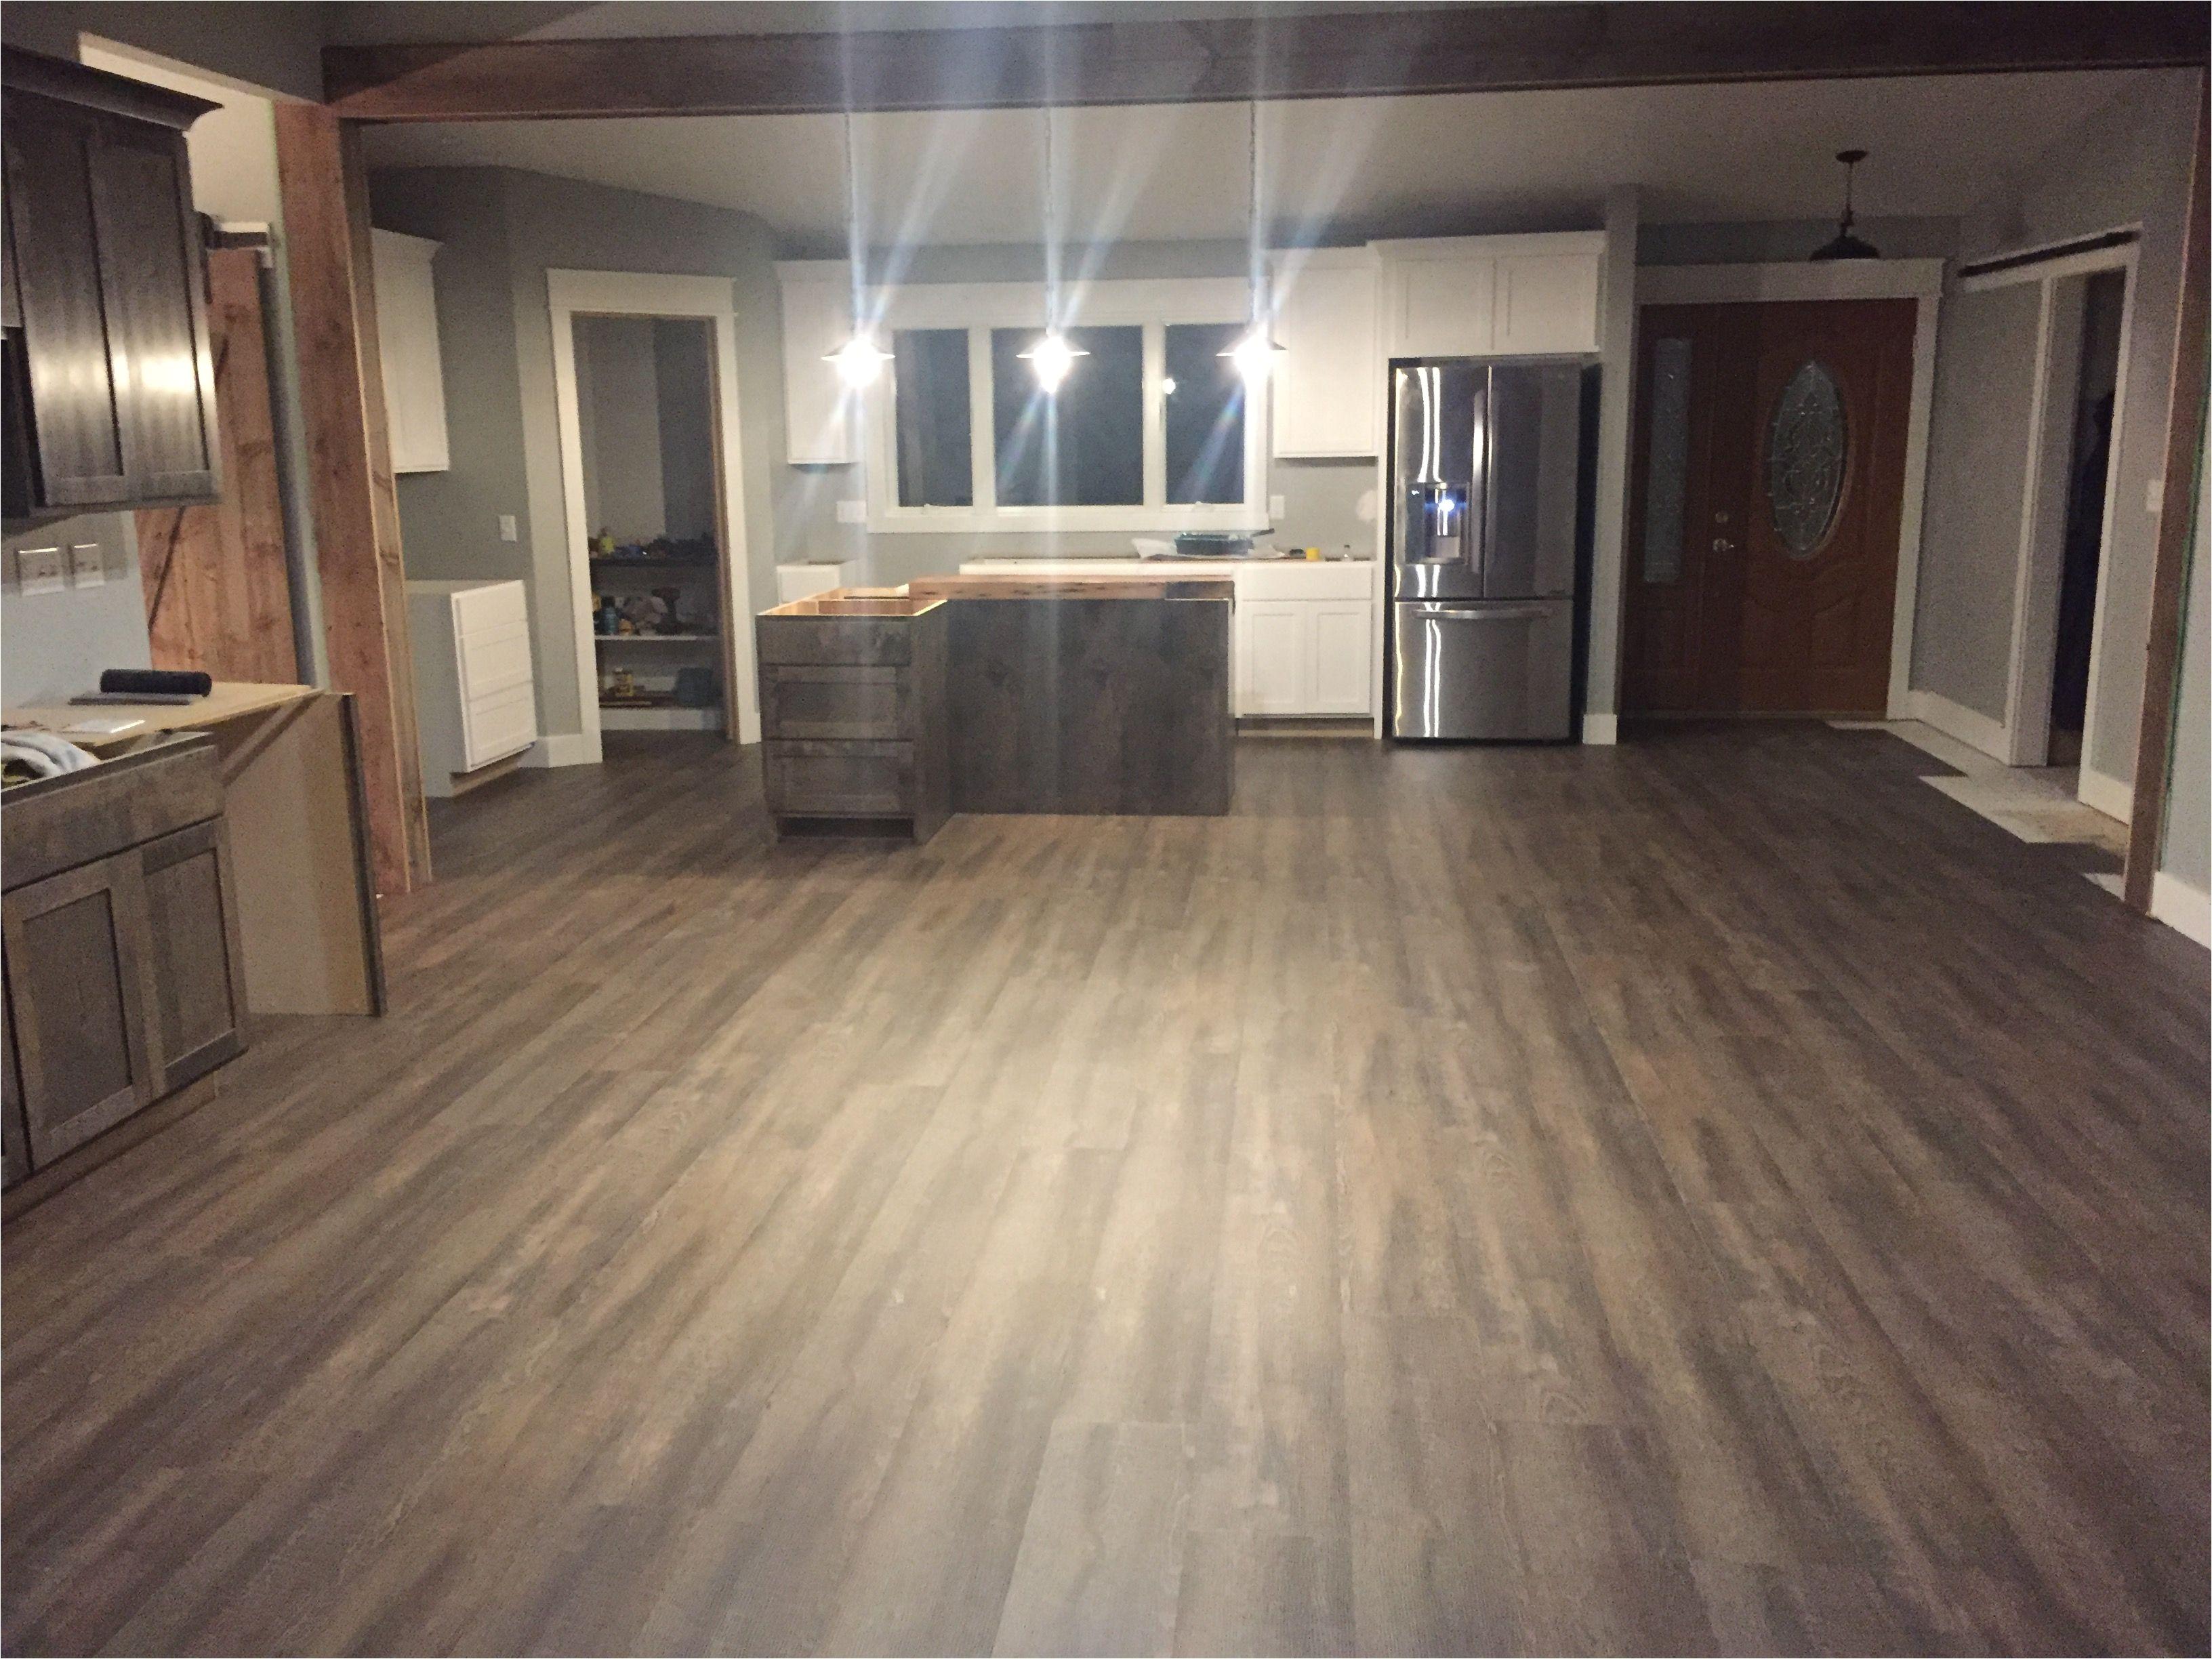 coretec plus xl 7 plank lvf luxury vinyl floor gray and brown tones rough sawn look planking